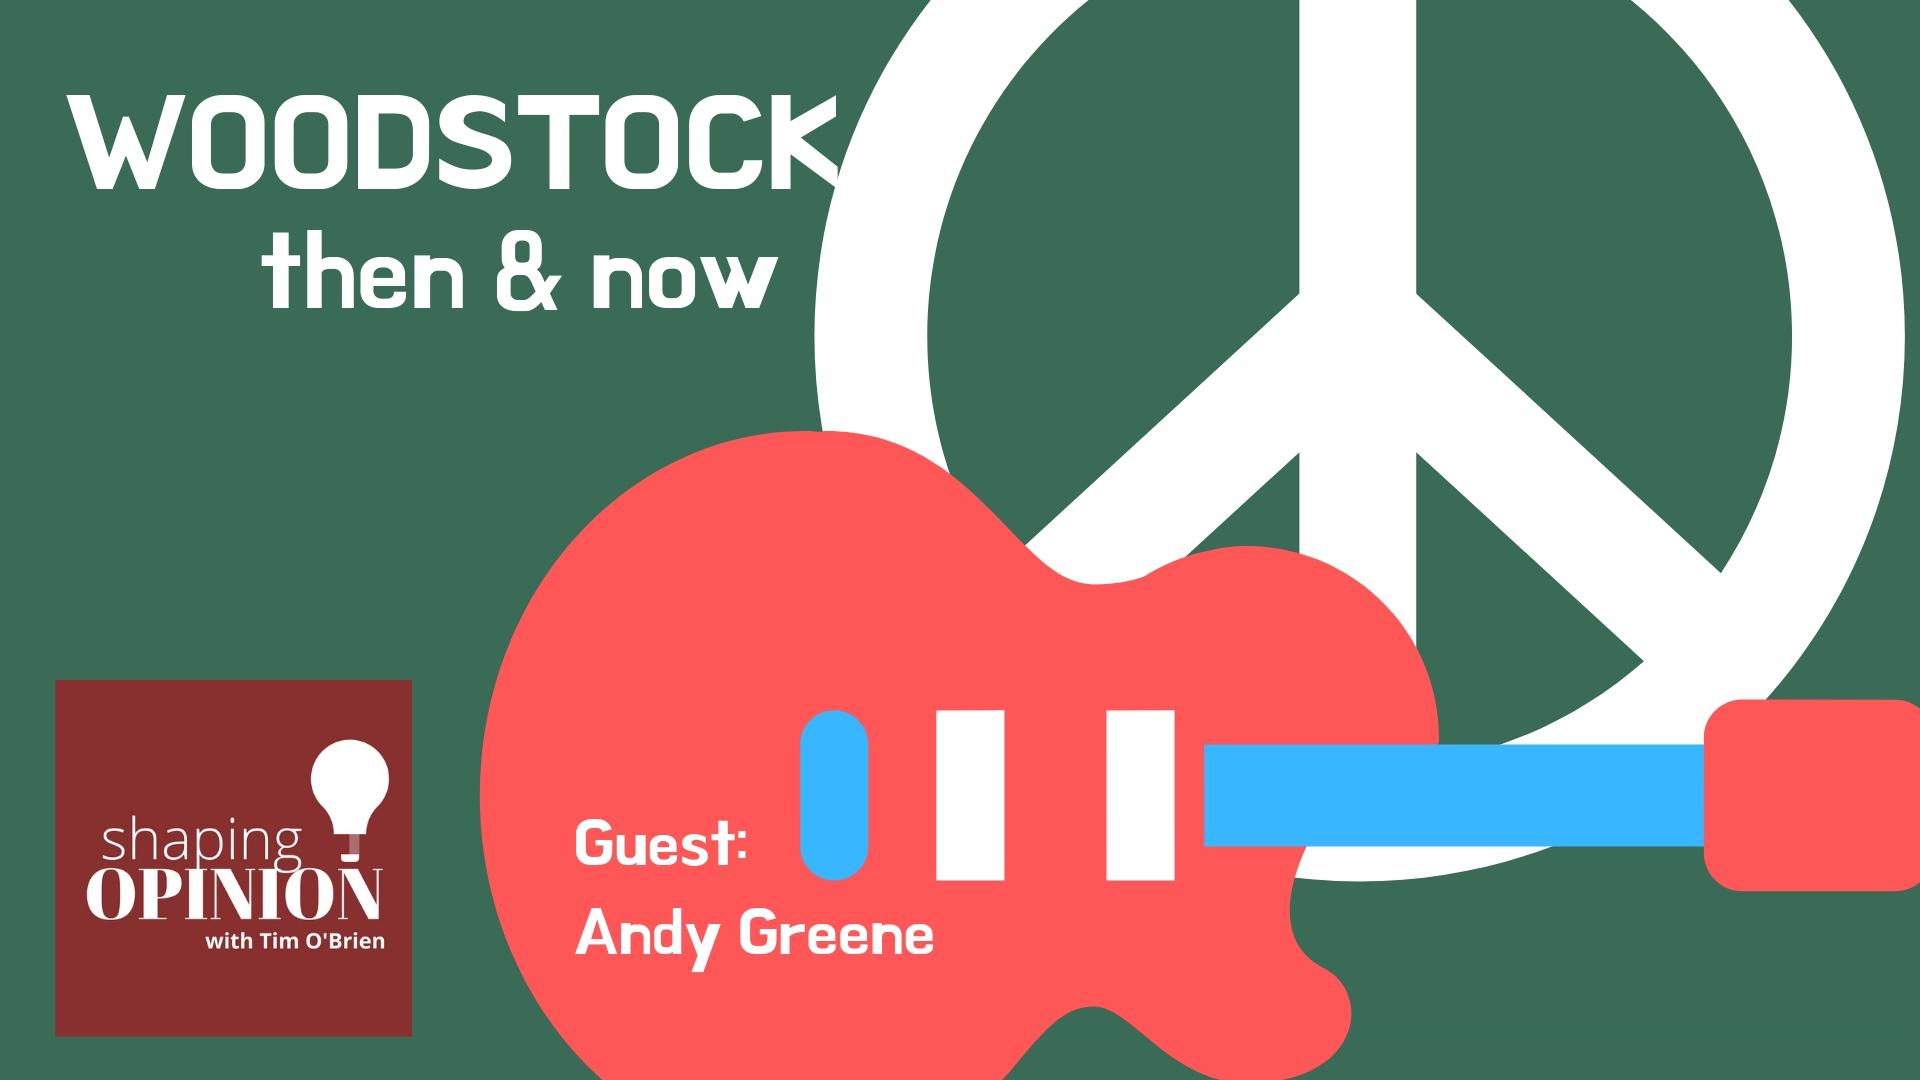 woodstock watkins glen 2020